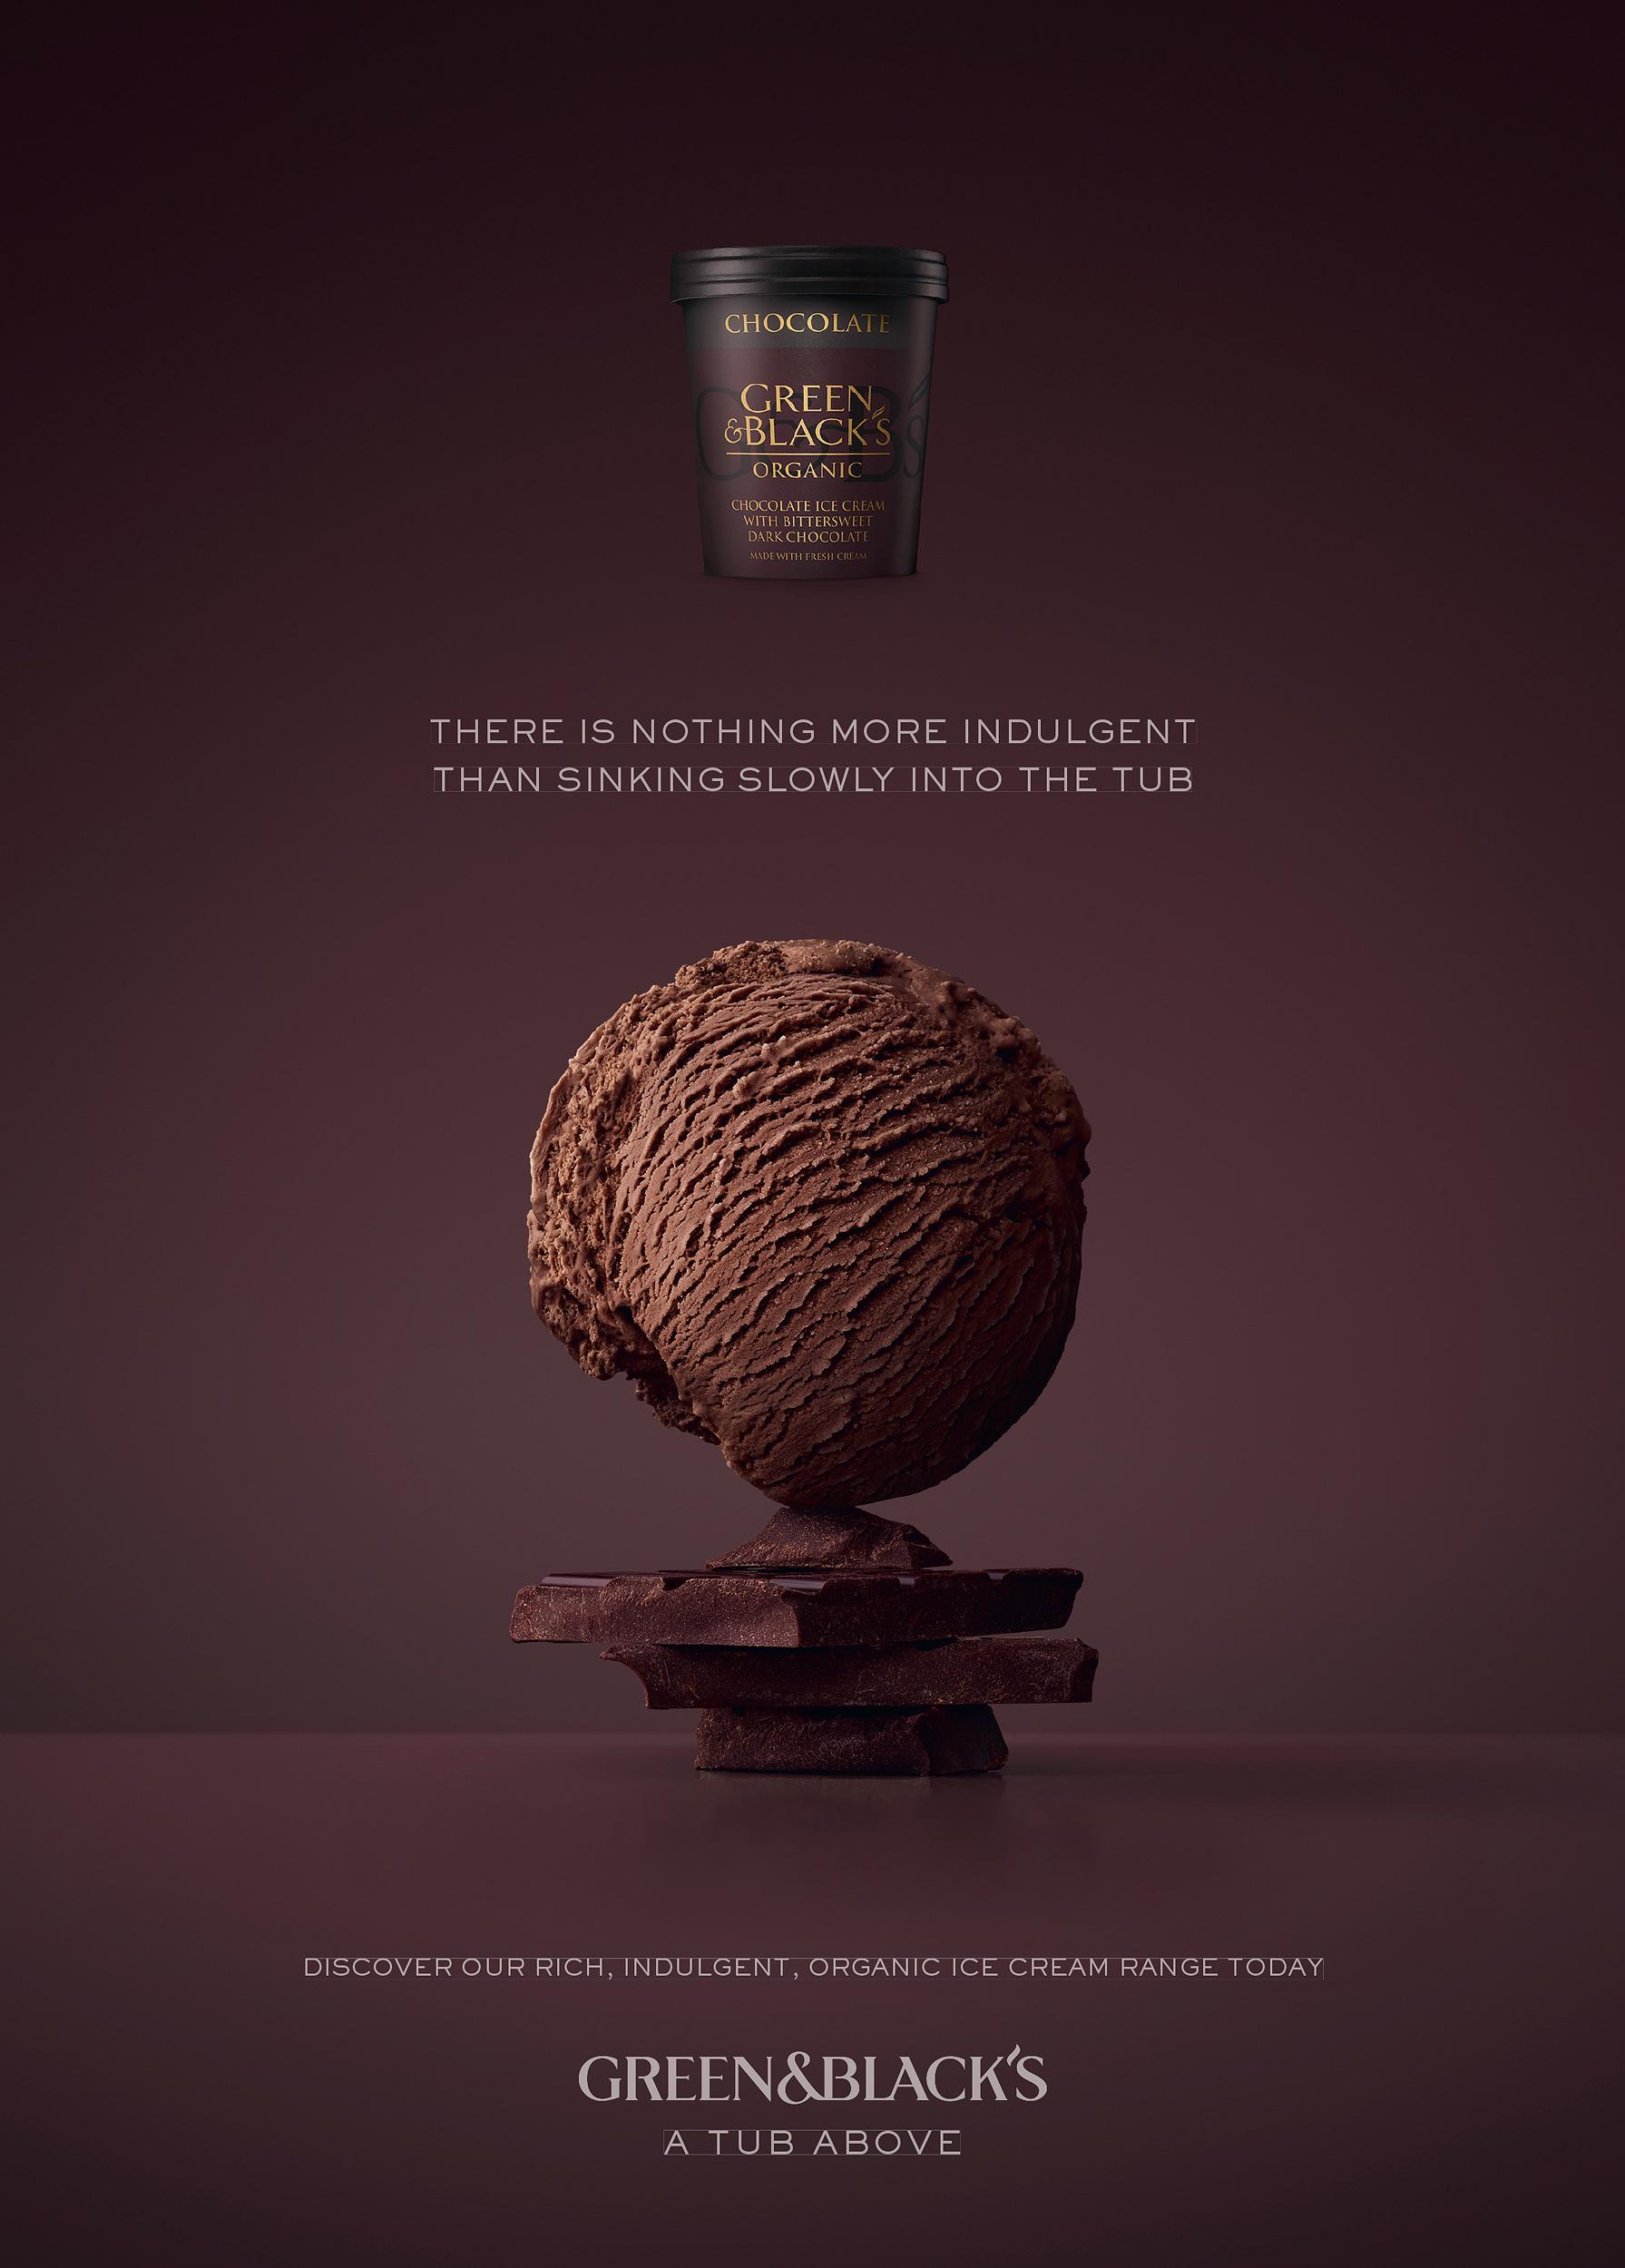 06267_01 Gr+Bl_Press Ad_Chocolate_BBC GoodFood_290x215_HR ad.jpg